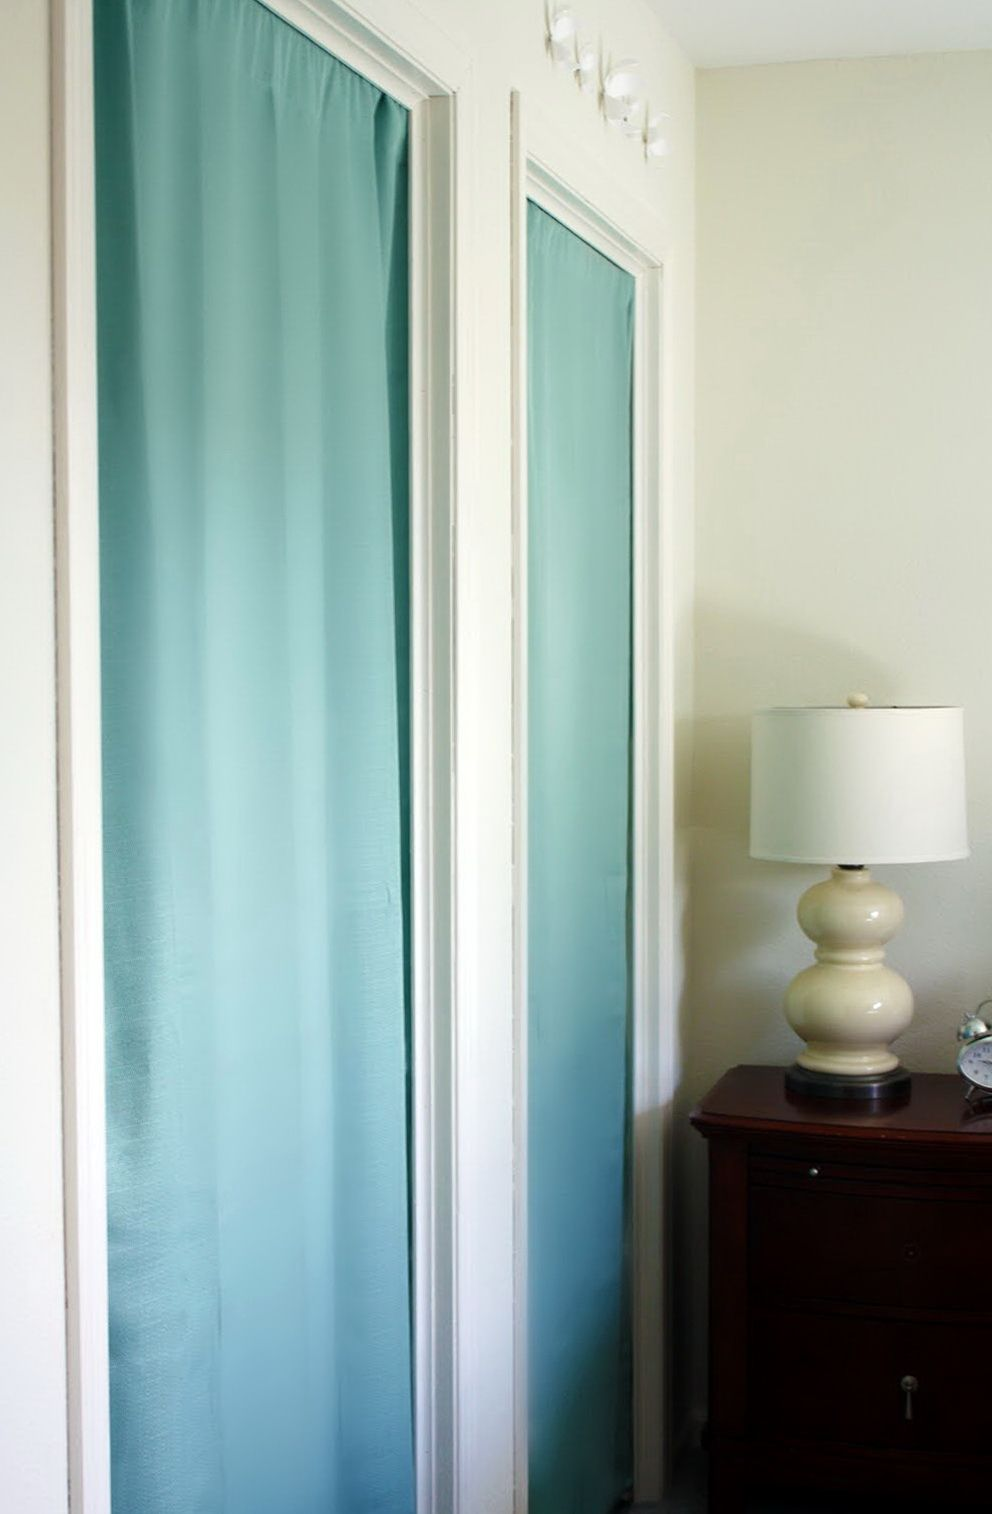 Best Closet Door Ideas To Spruce Up Your Room Replacing Closet Doors Diy Home Decor Bedroom Girl Closet Curtains